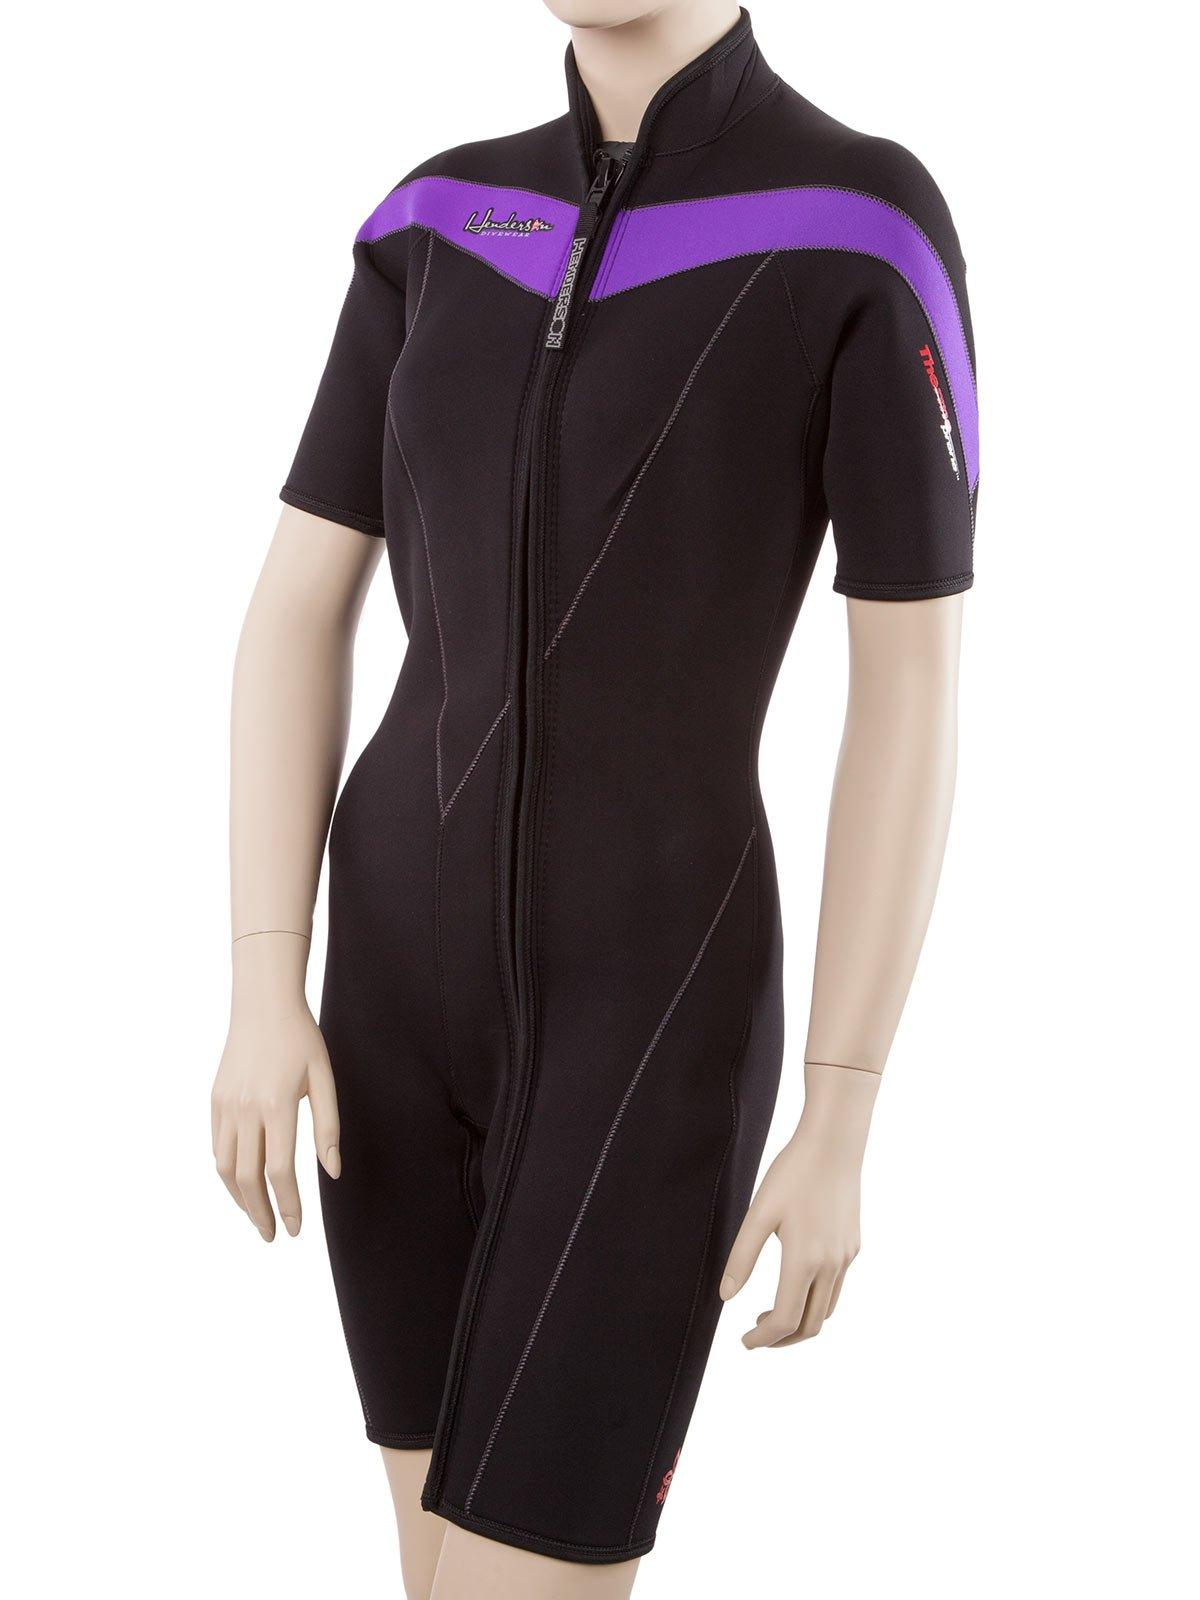 Henderson Thermoprene 3mm womens front zip wetsuit (with Plus, Tall, & Petite) Women's 6 Black/dark purple